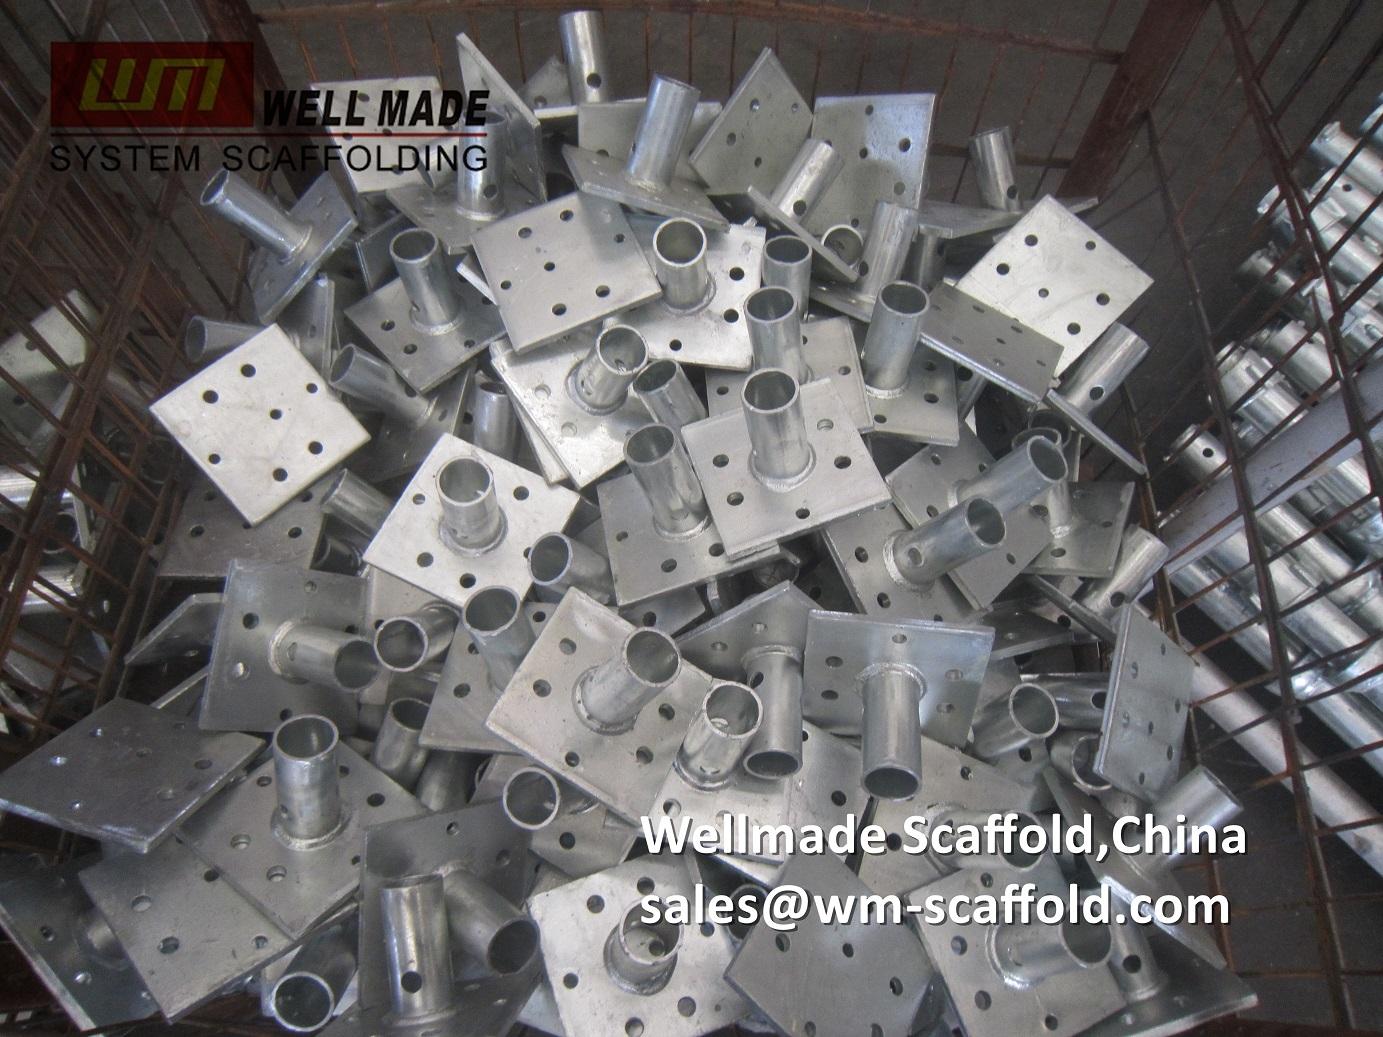 SGB Scaffolding Cuplock System Components Galvanized Socket